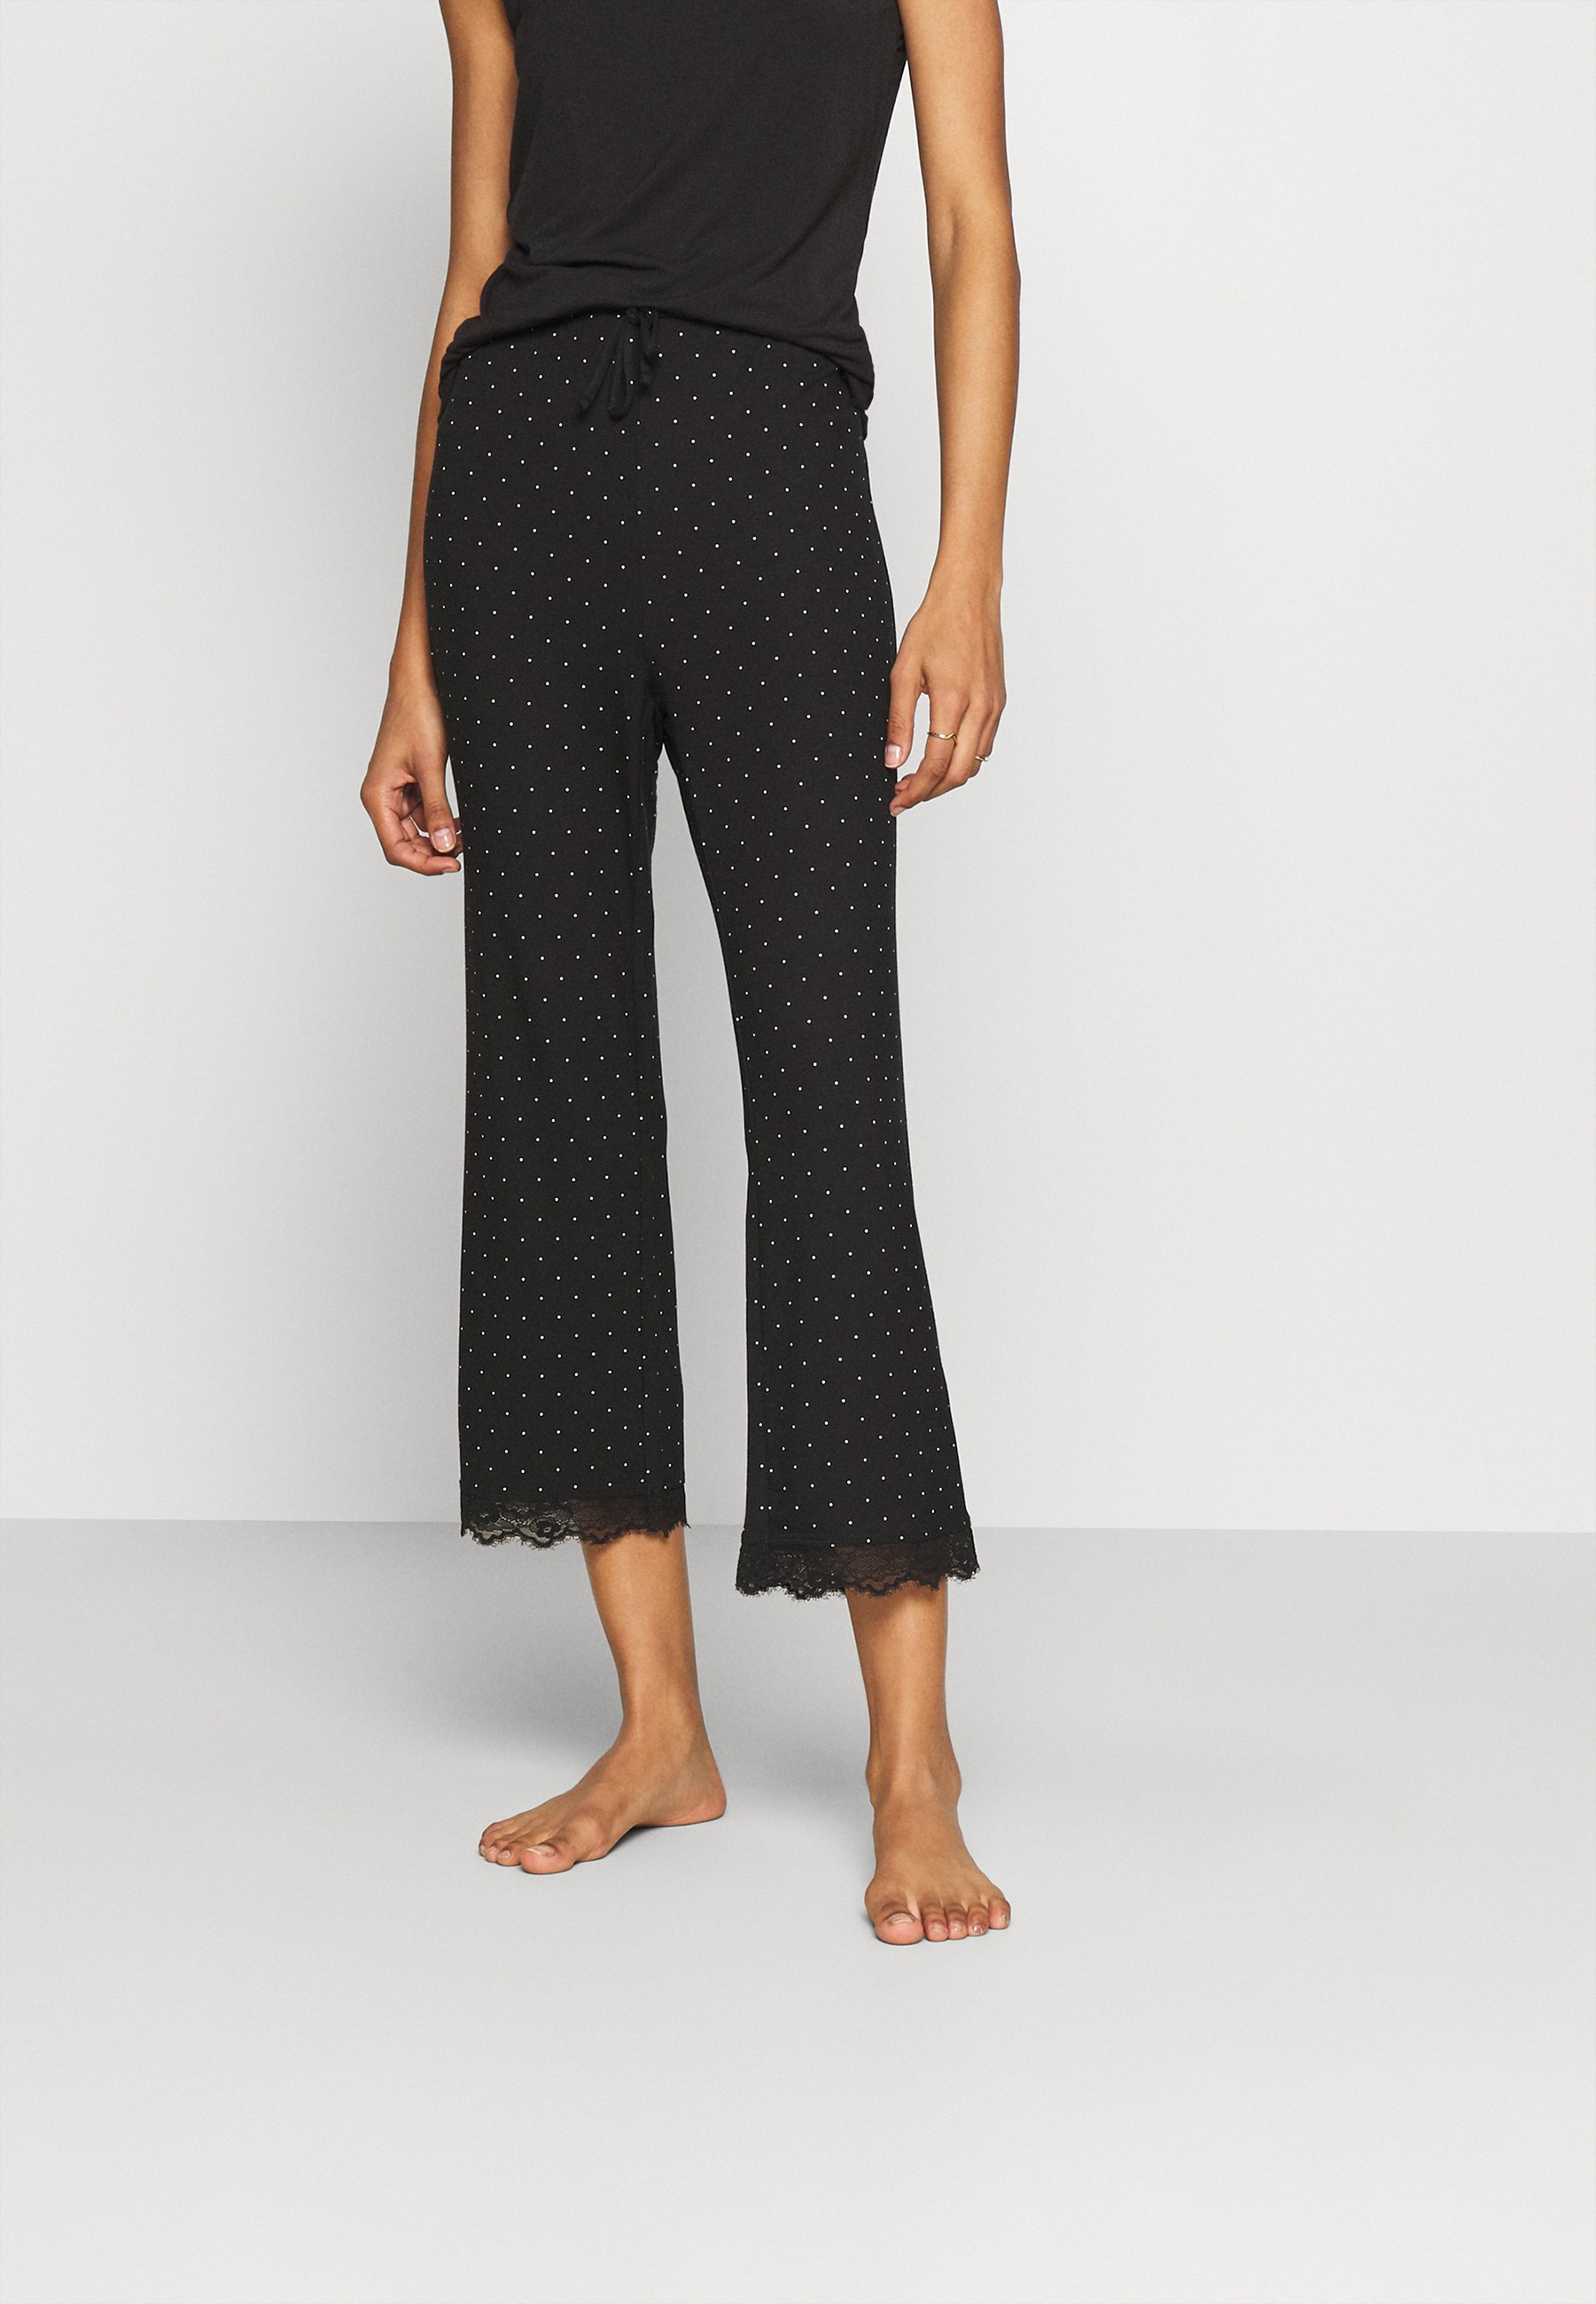 Donna NIGHT TROUSERS DOT - Pantaloni del pigiama